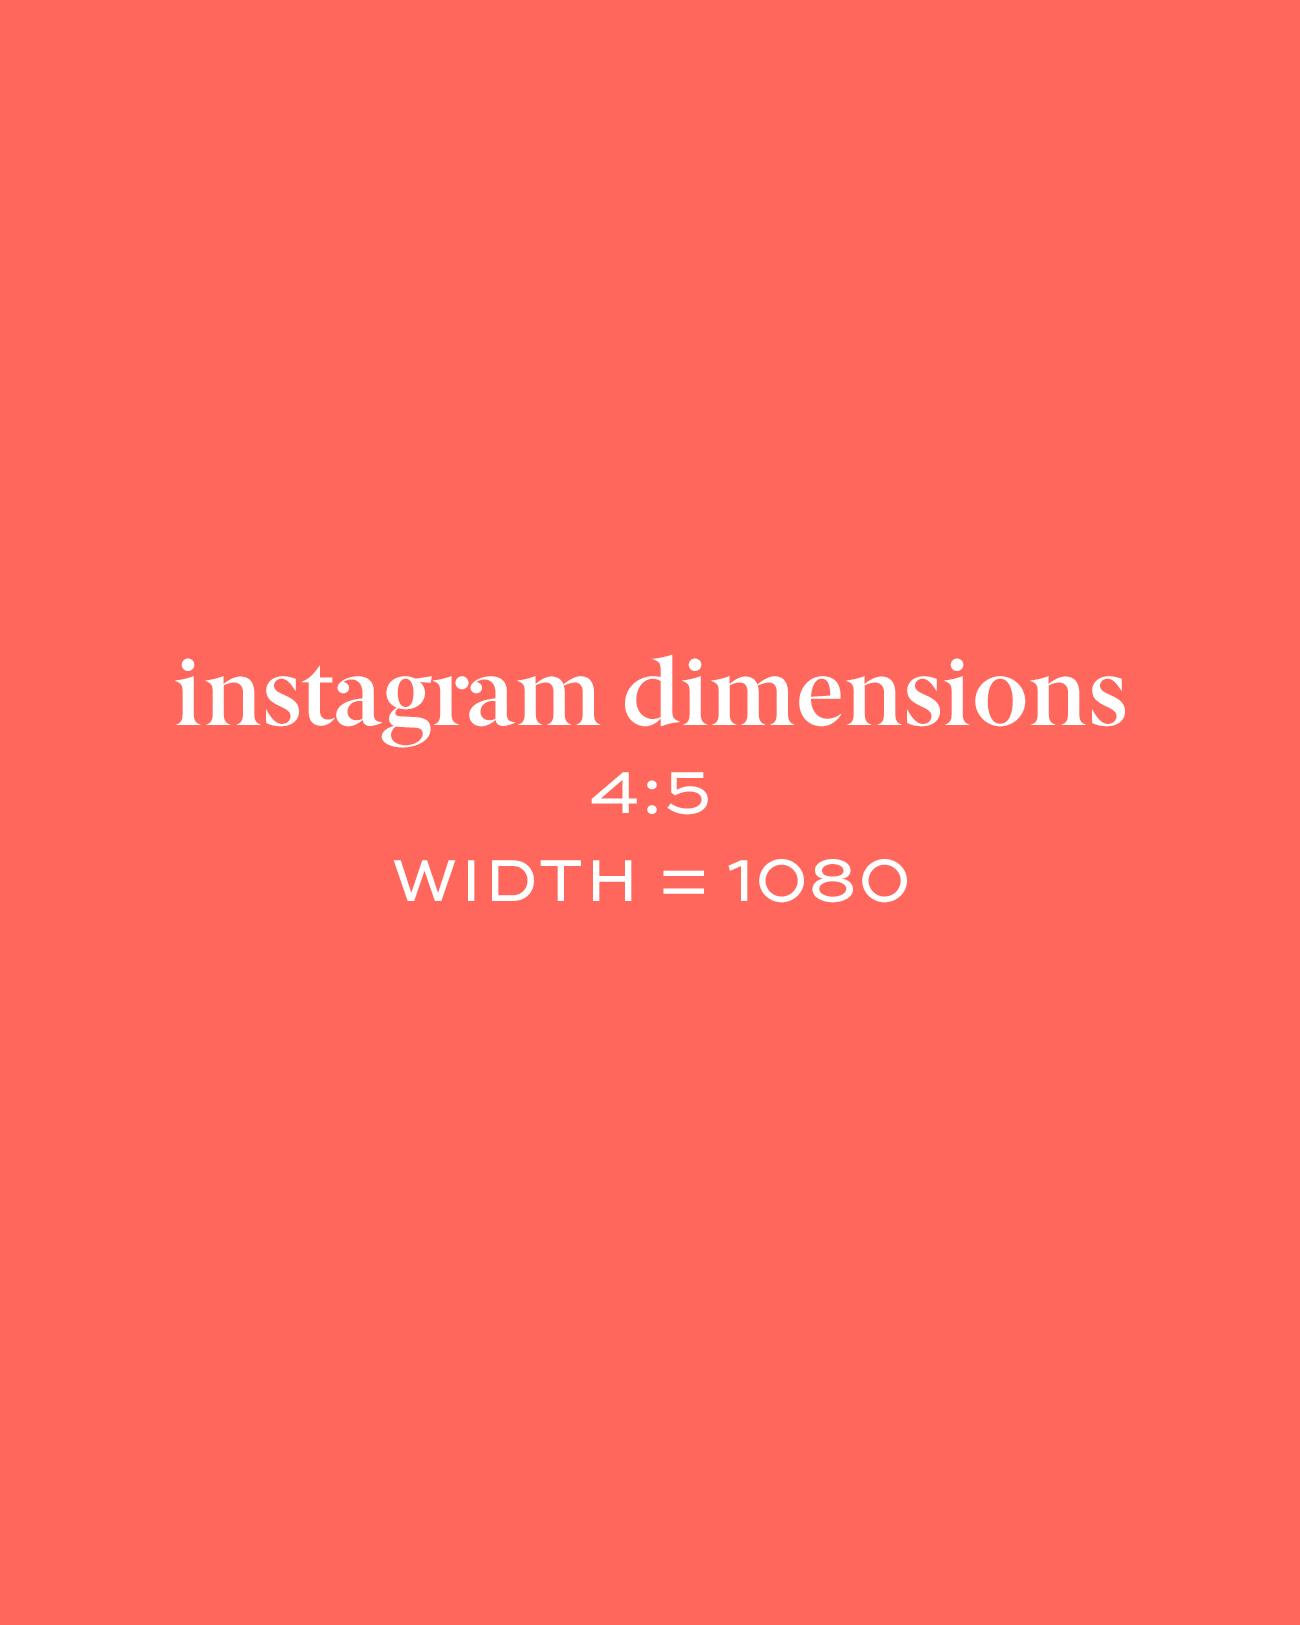 instagram resizing 4:5